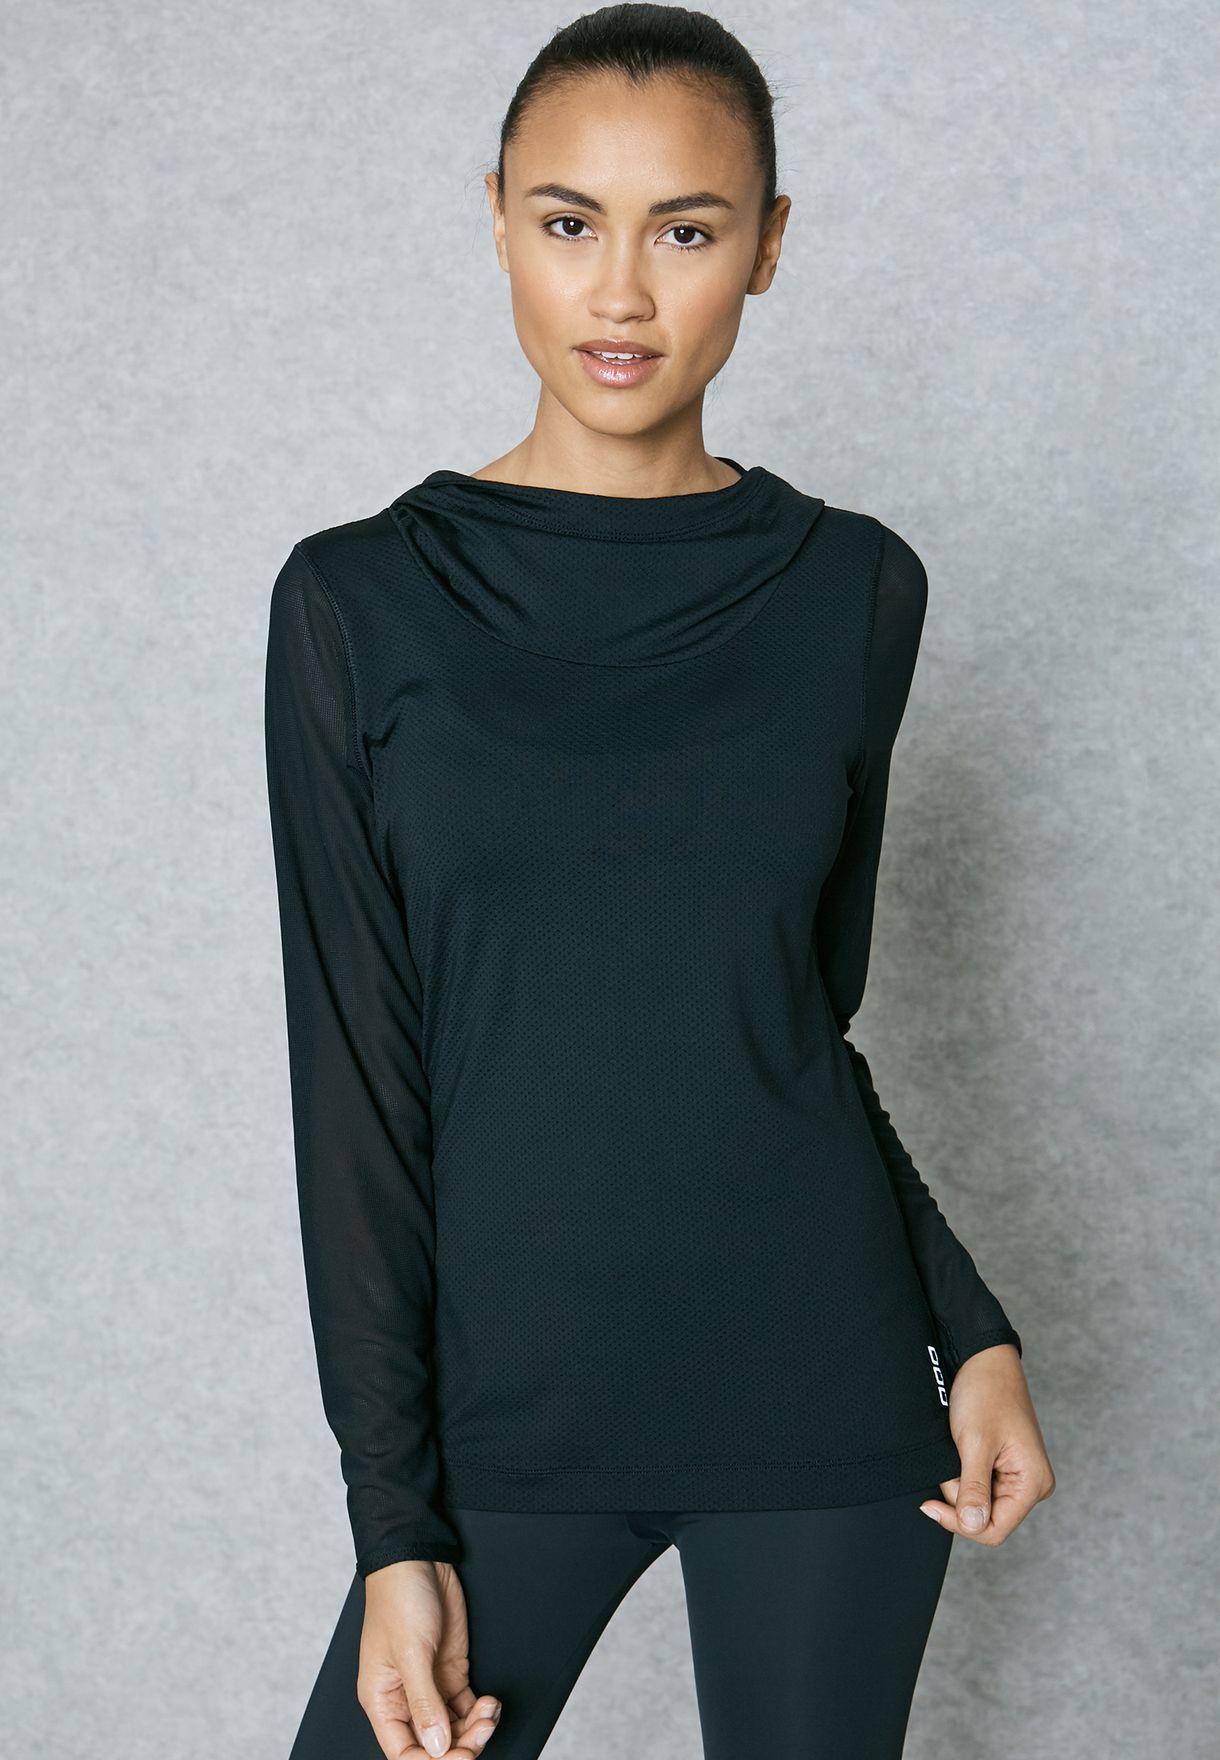 9501371afca0 Shop Lorna Jane black Troya Excel TShirt 051783 for Women in UAE 80 ...